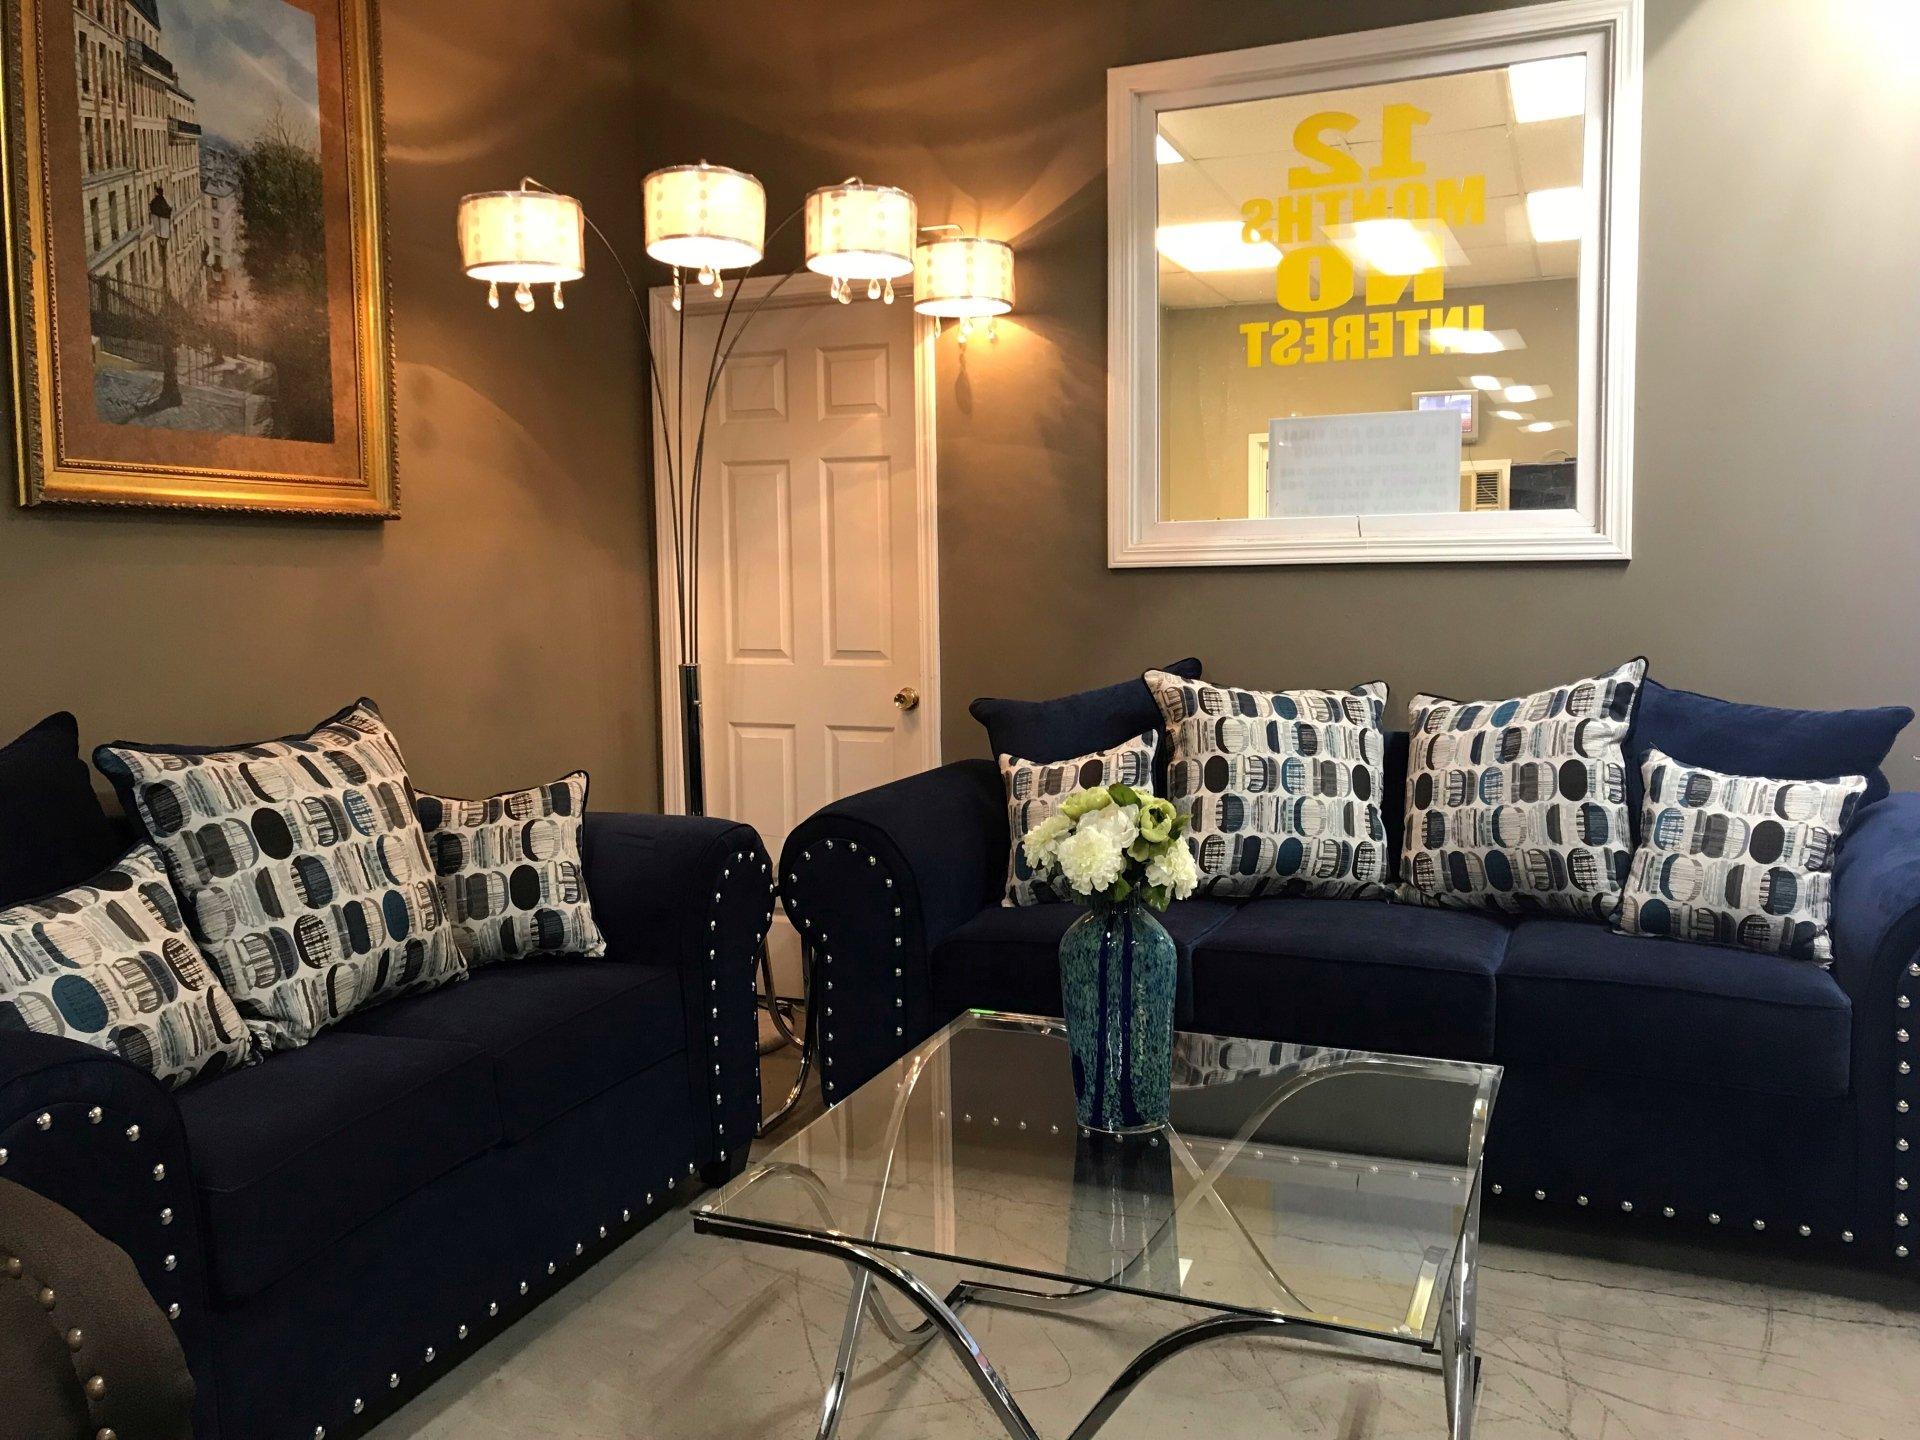 Appealing Affordable Living Room Furniture Sacramento Stockton Ca Labarata Furniture